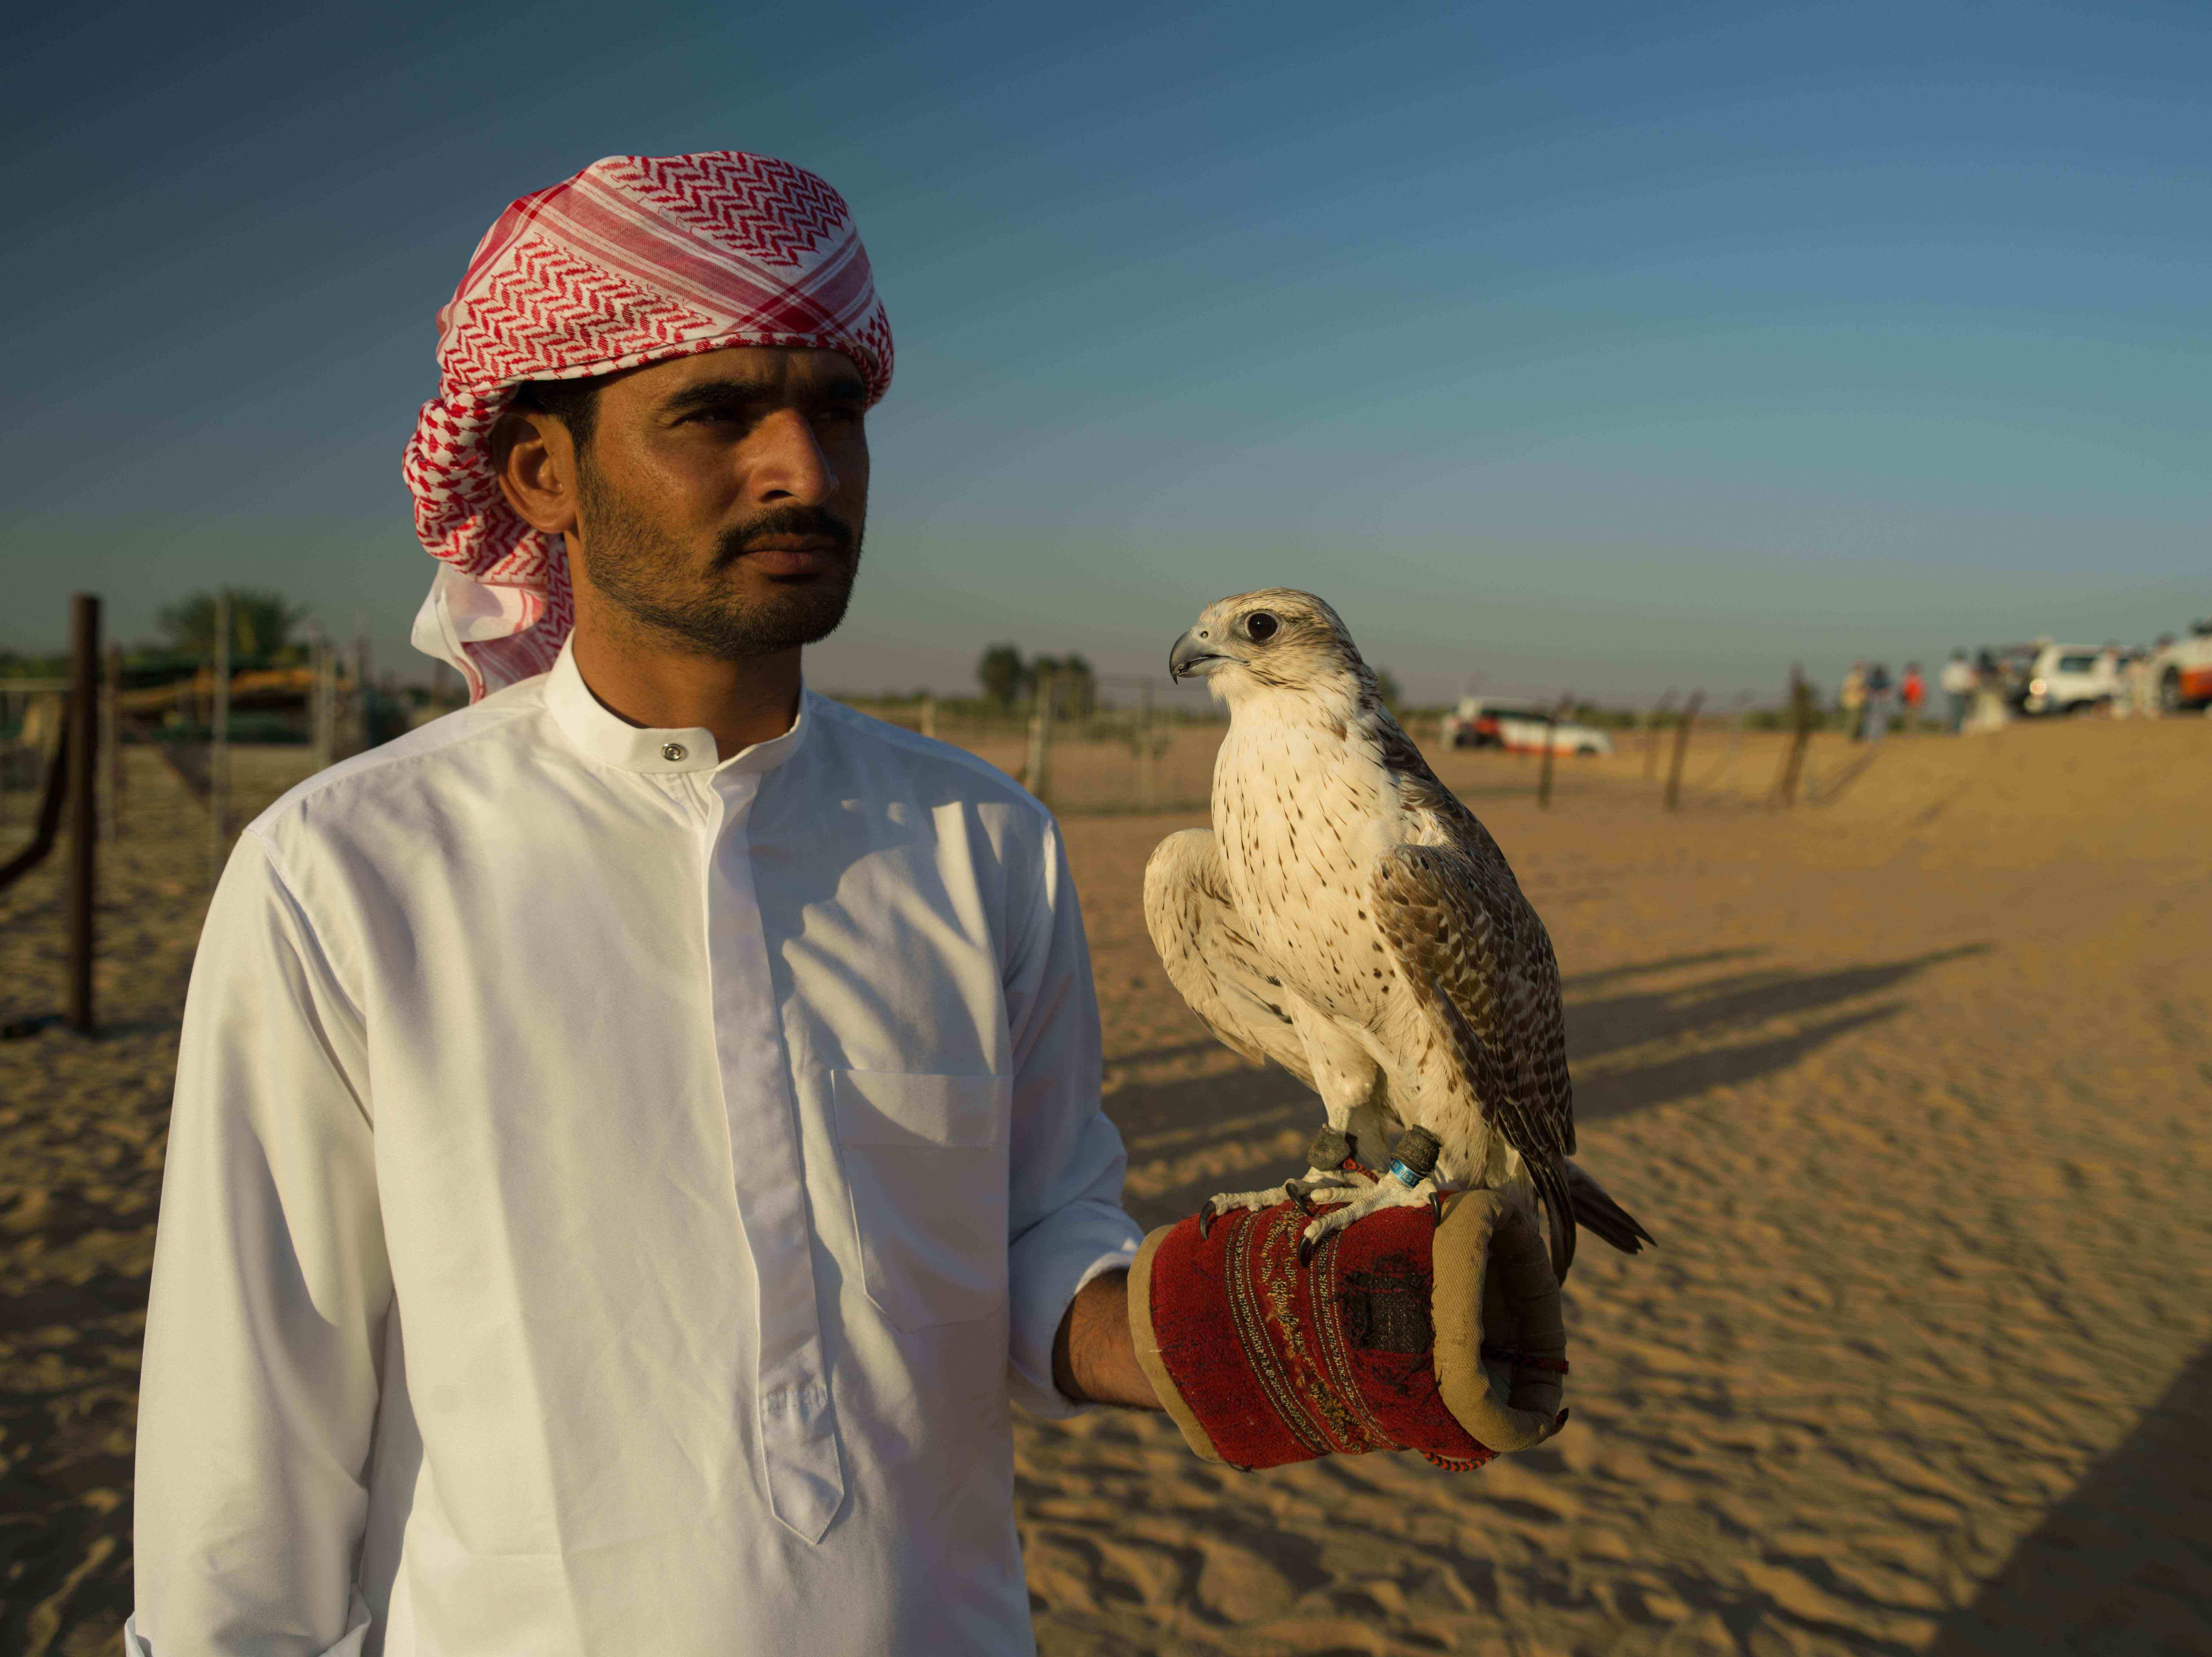 Bedouin Falconry